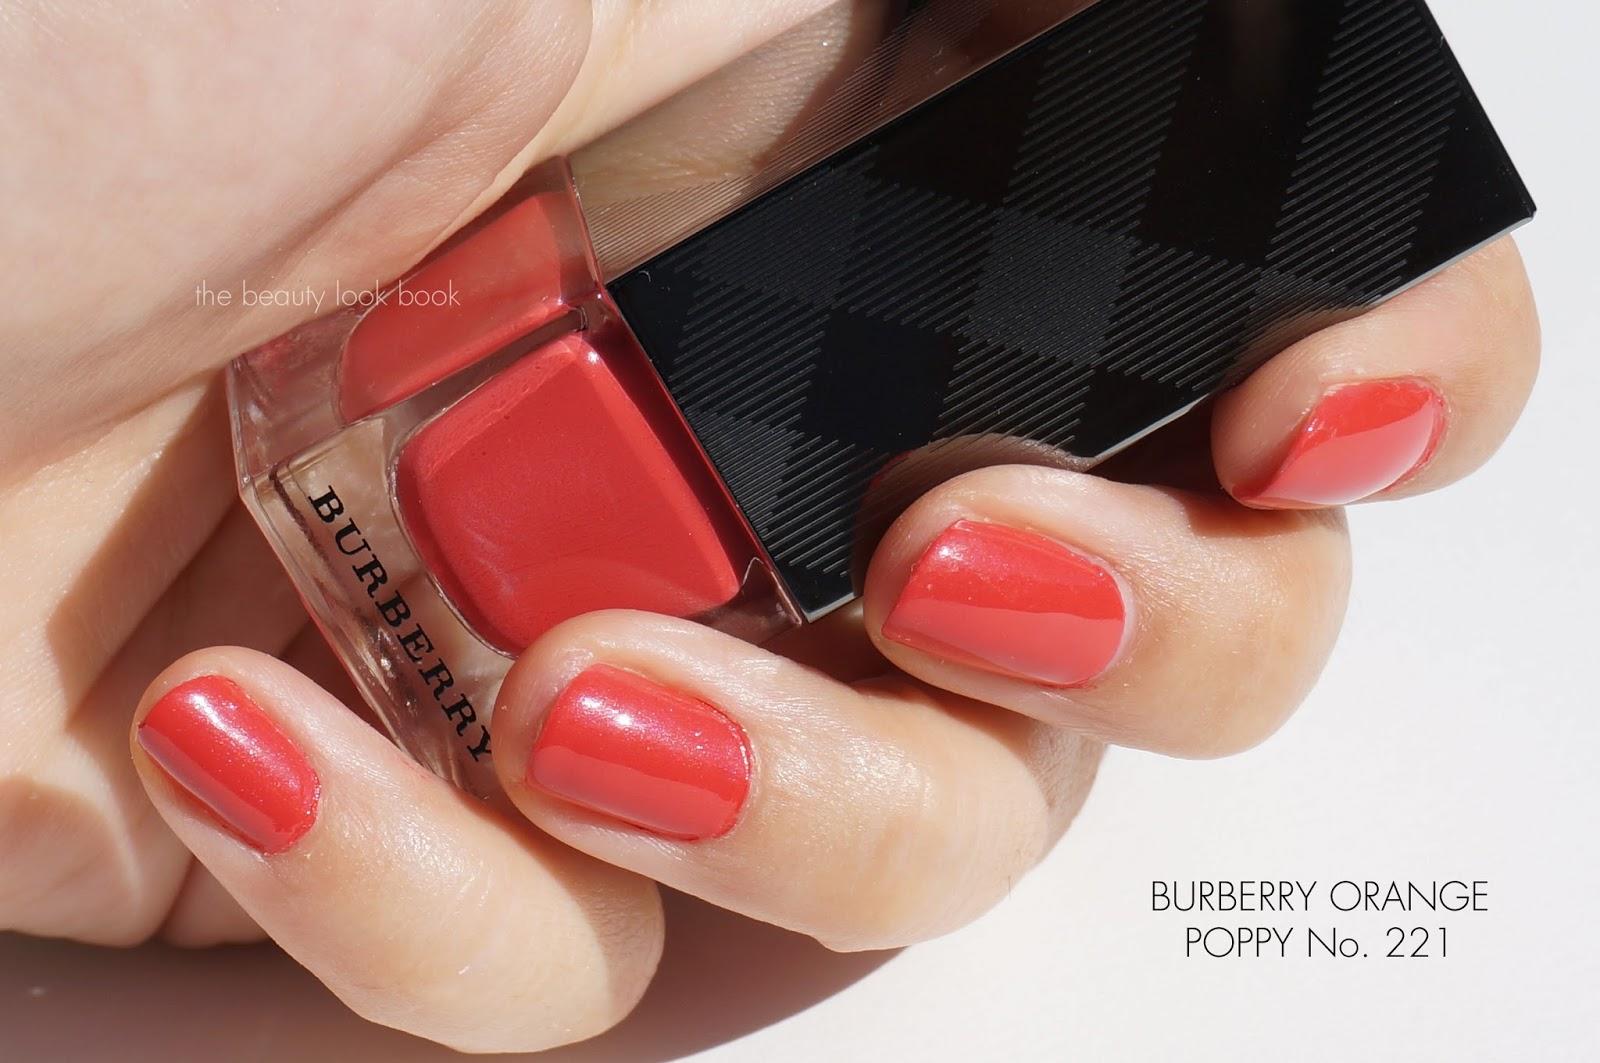 Burberry Summer Showers Lip Glow Balm And Nail Polishes Orange Poppy Pink Peony Azalea